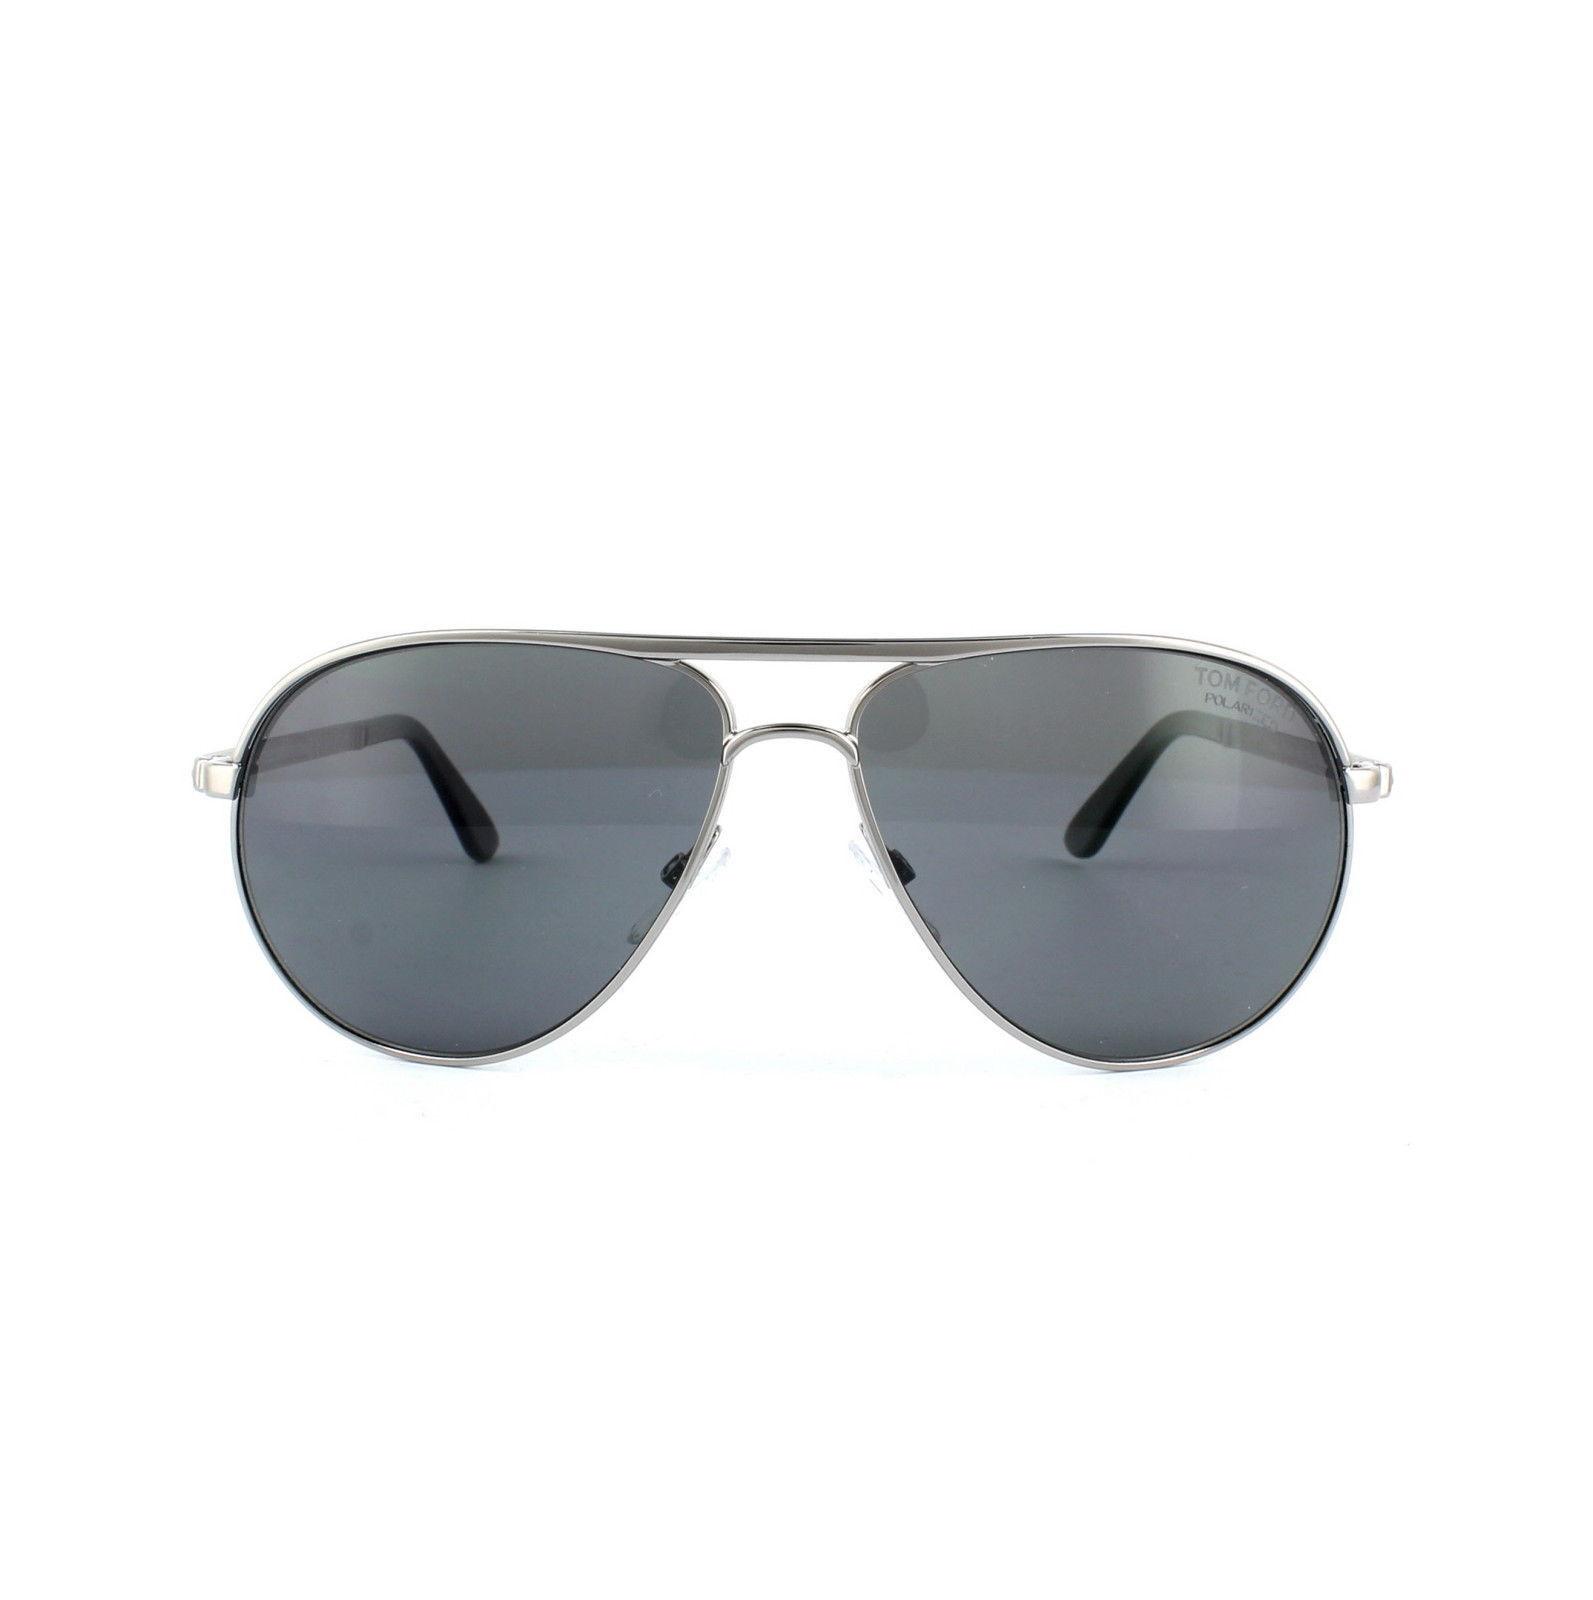 f47f8774c8753 Polarized James Bond 007 Skyfall Tom Ford Marko Aviator Sunglasses ...